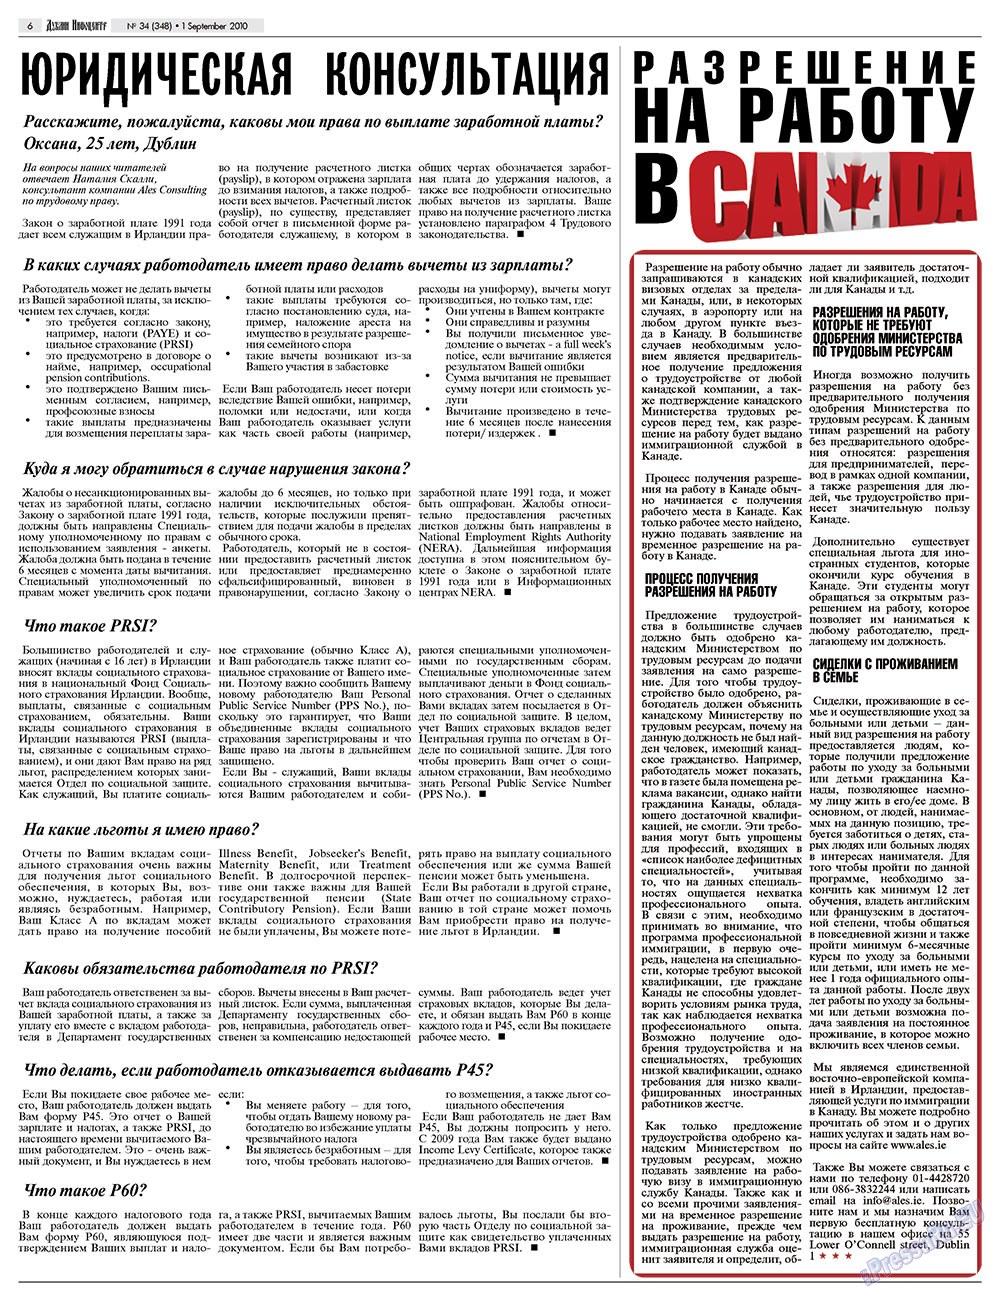 Дублин инфоцентр (газета). 2010 год, номер 34, стр. 6